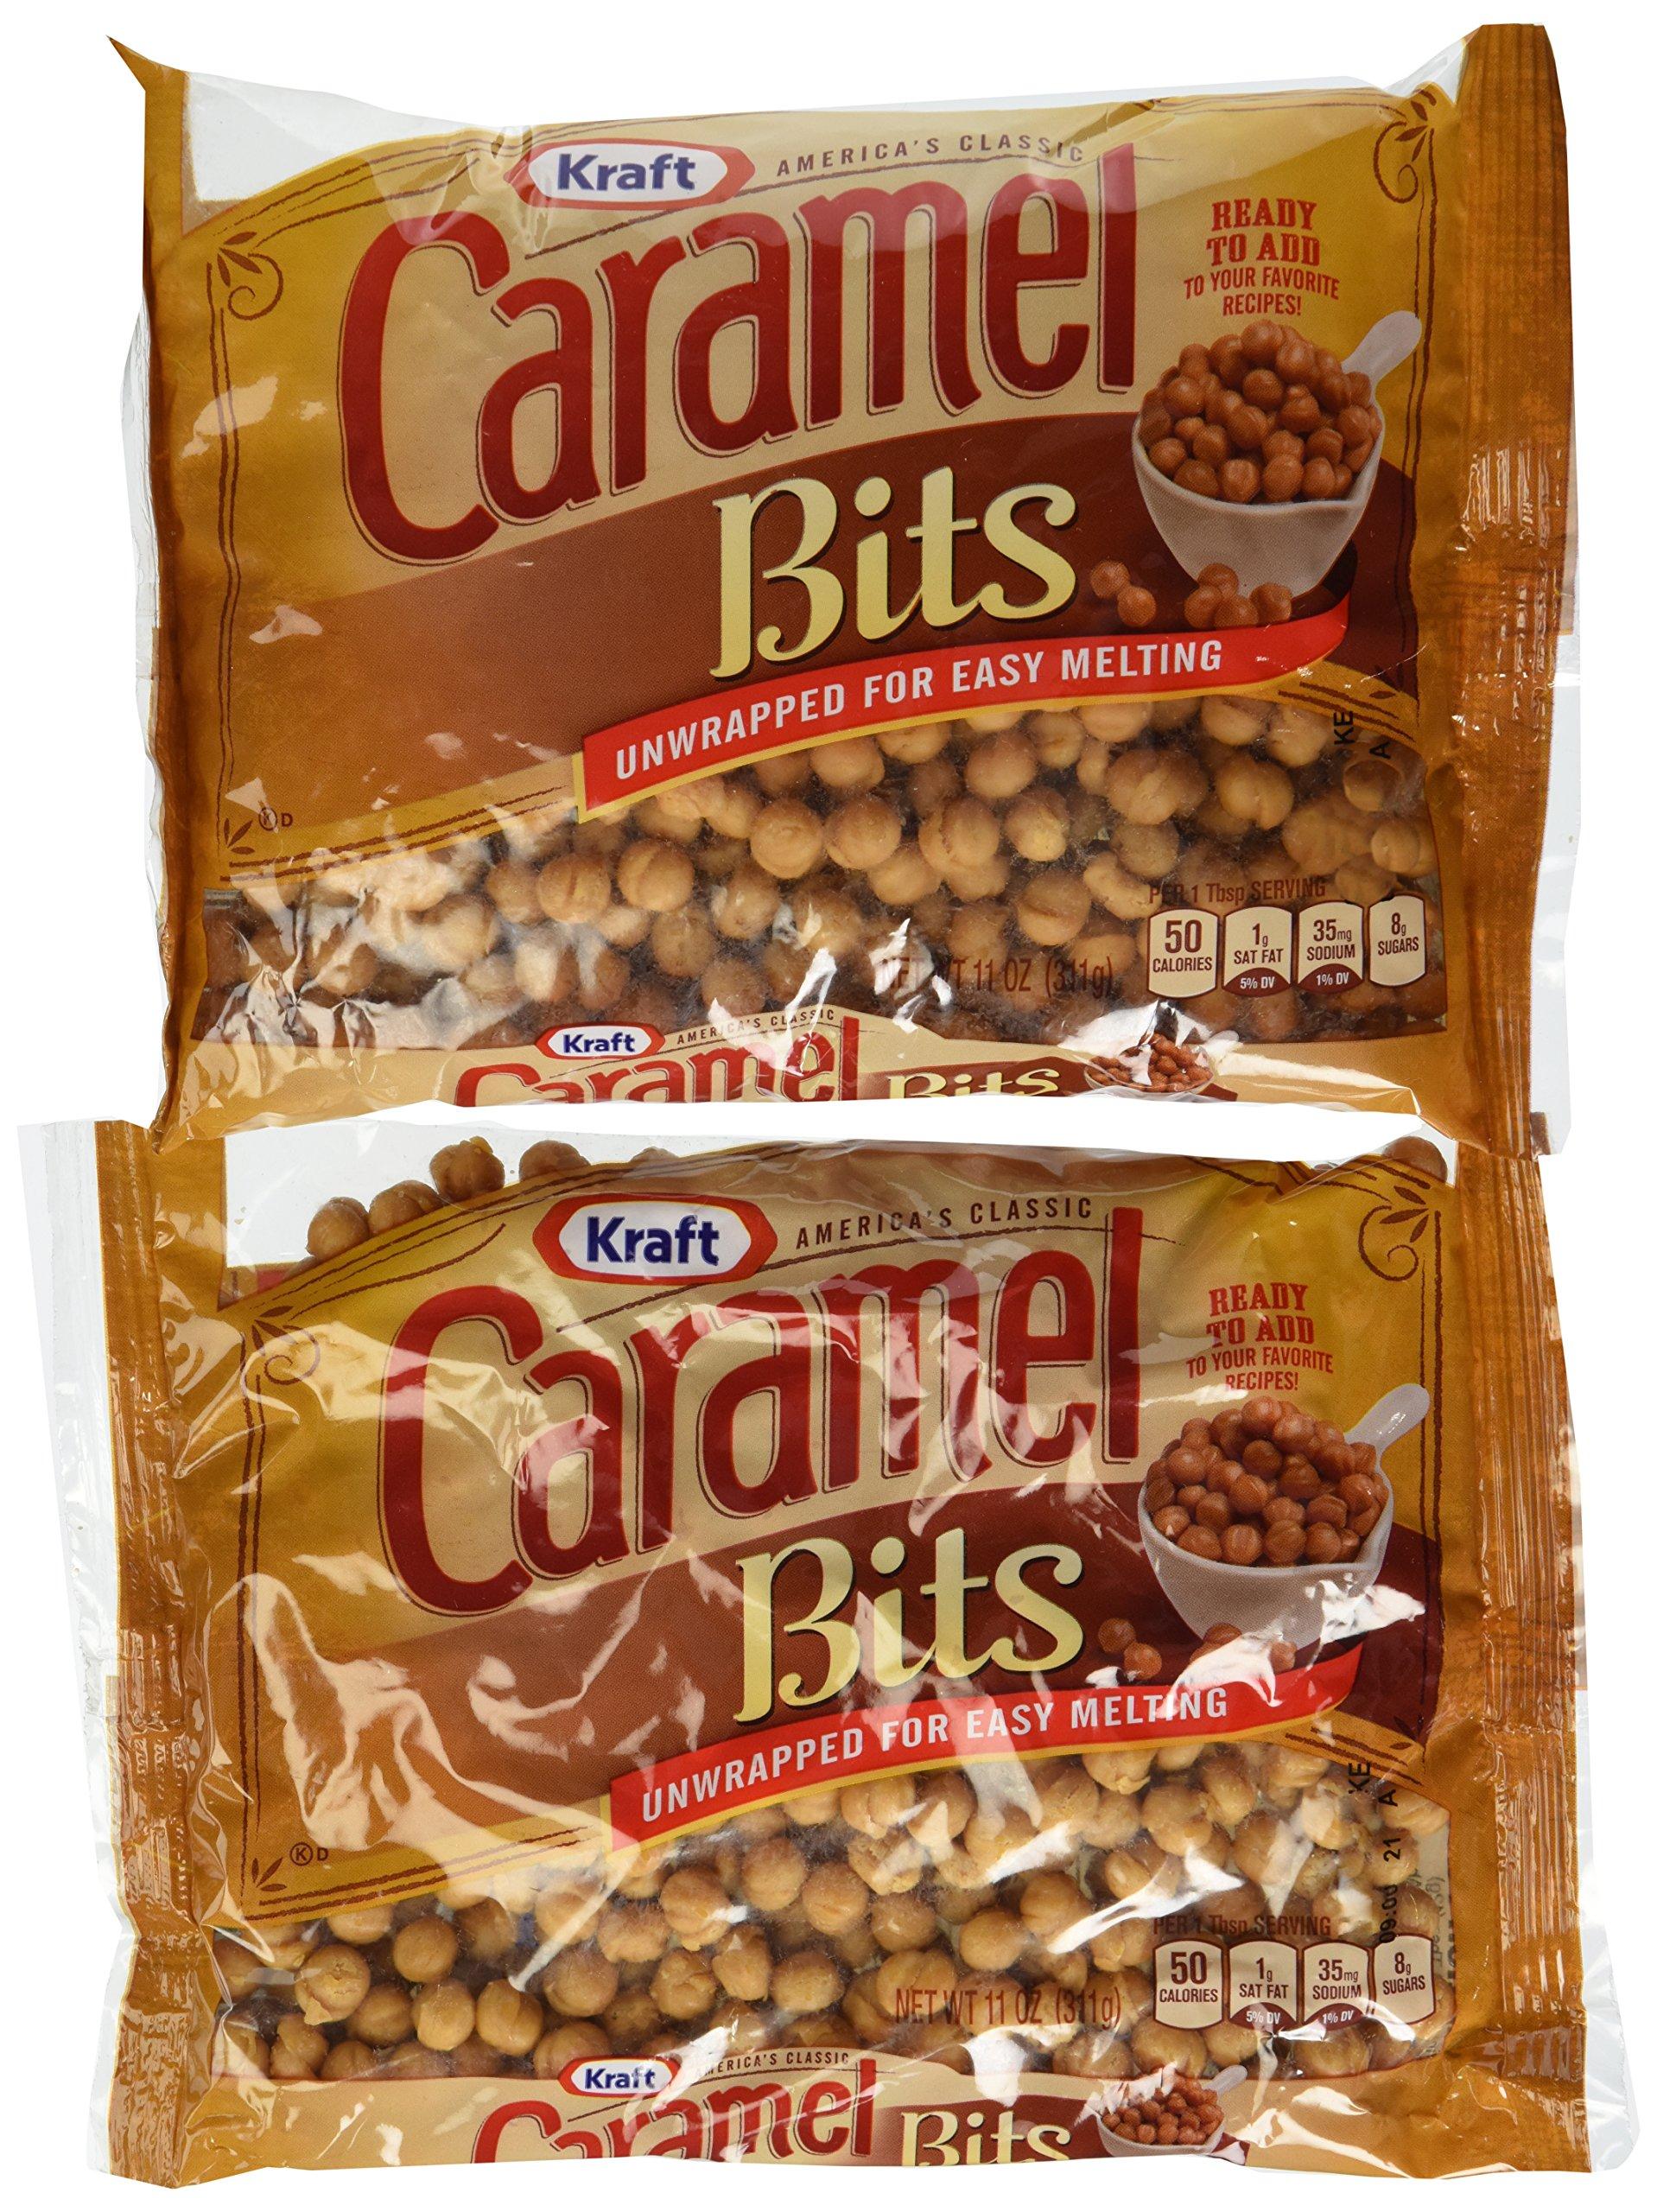 Kraft Caramel Candy Bits (11 oz Bags, Pack of 12)